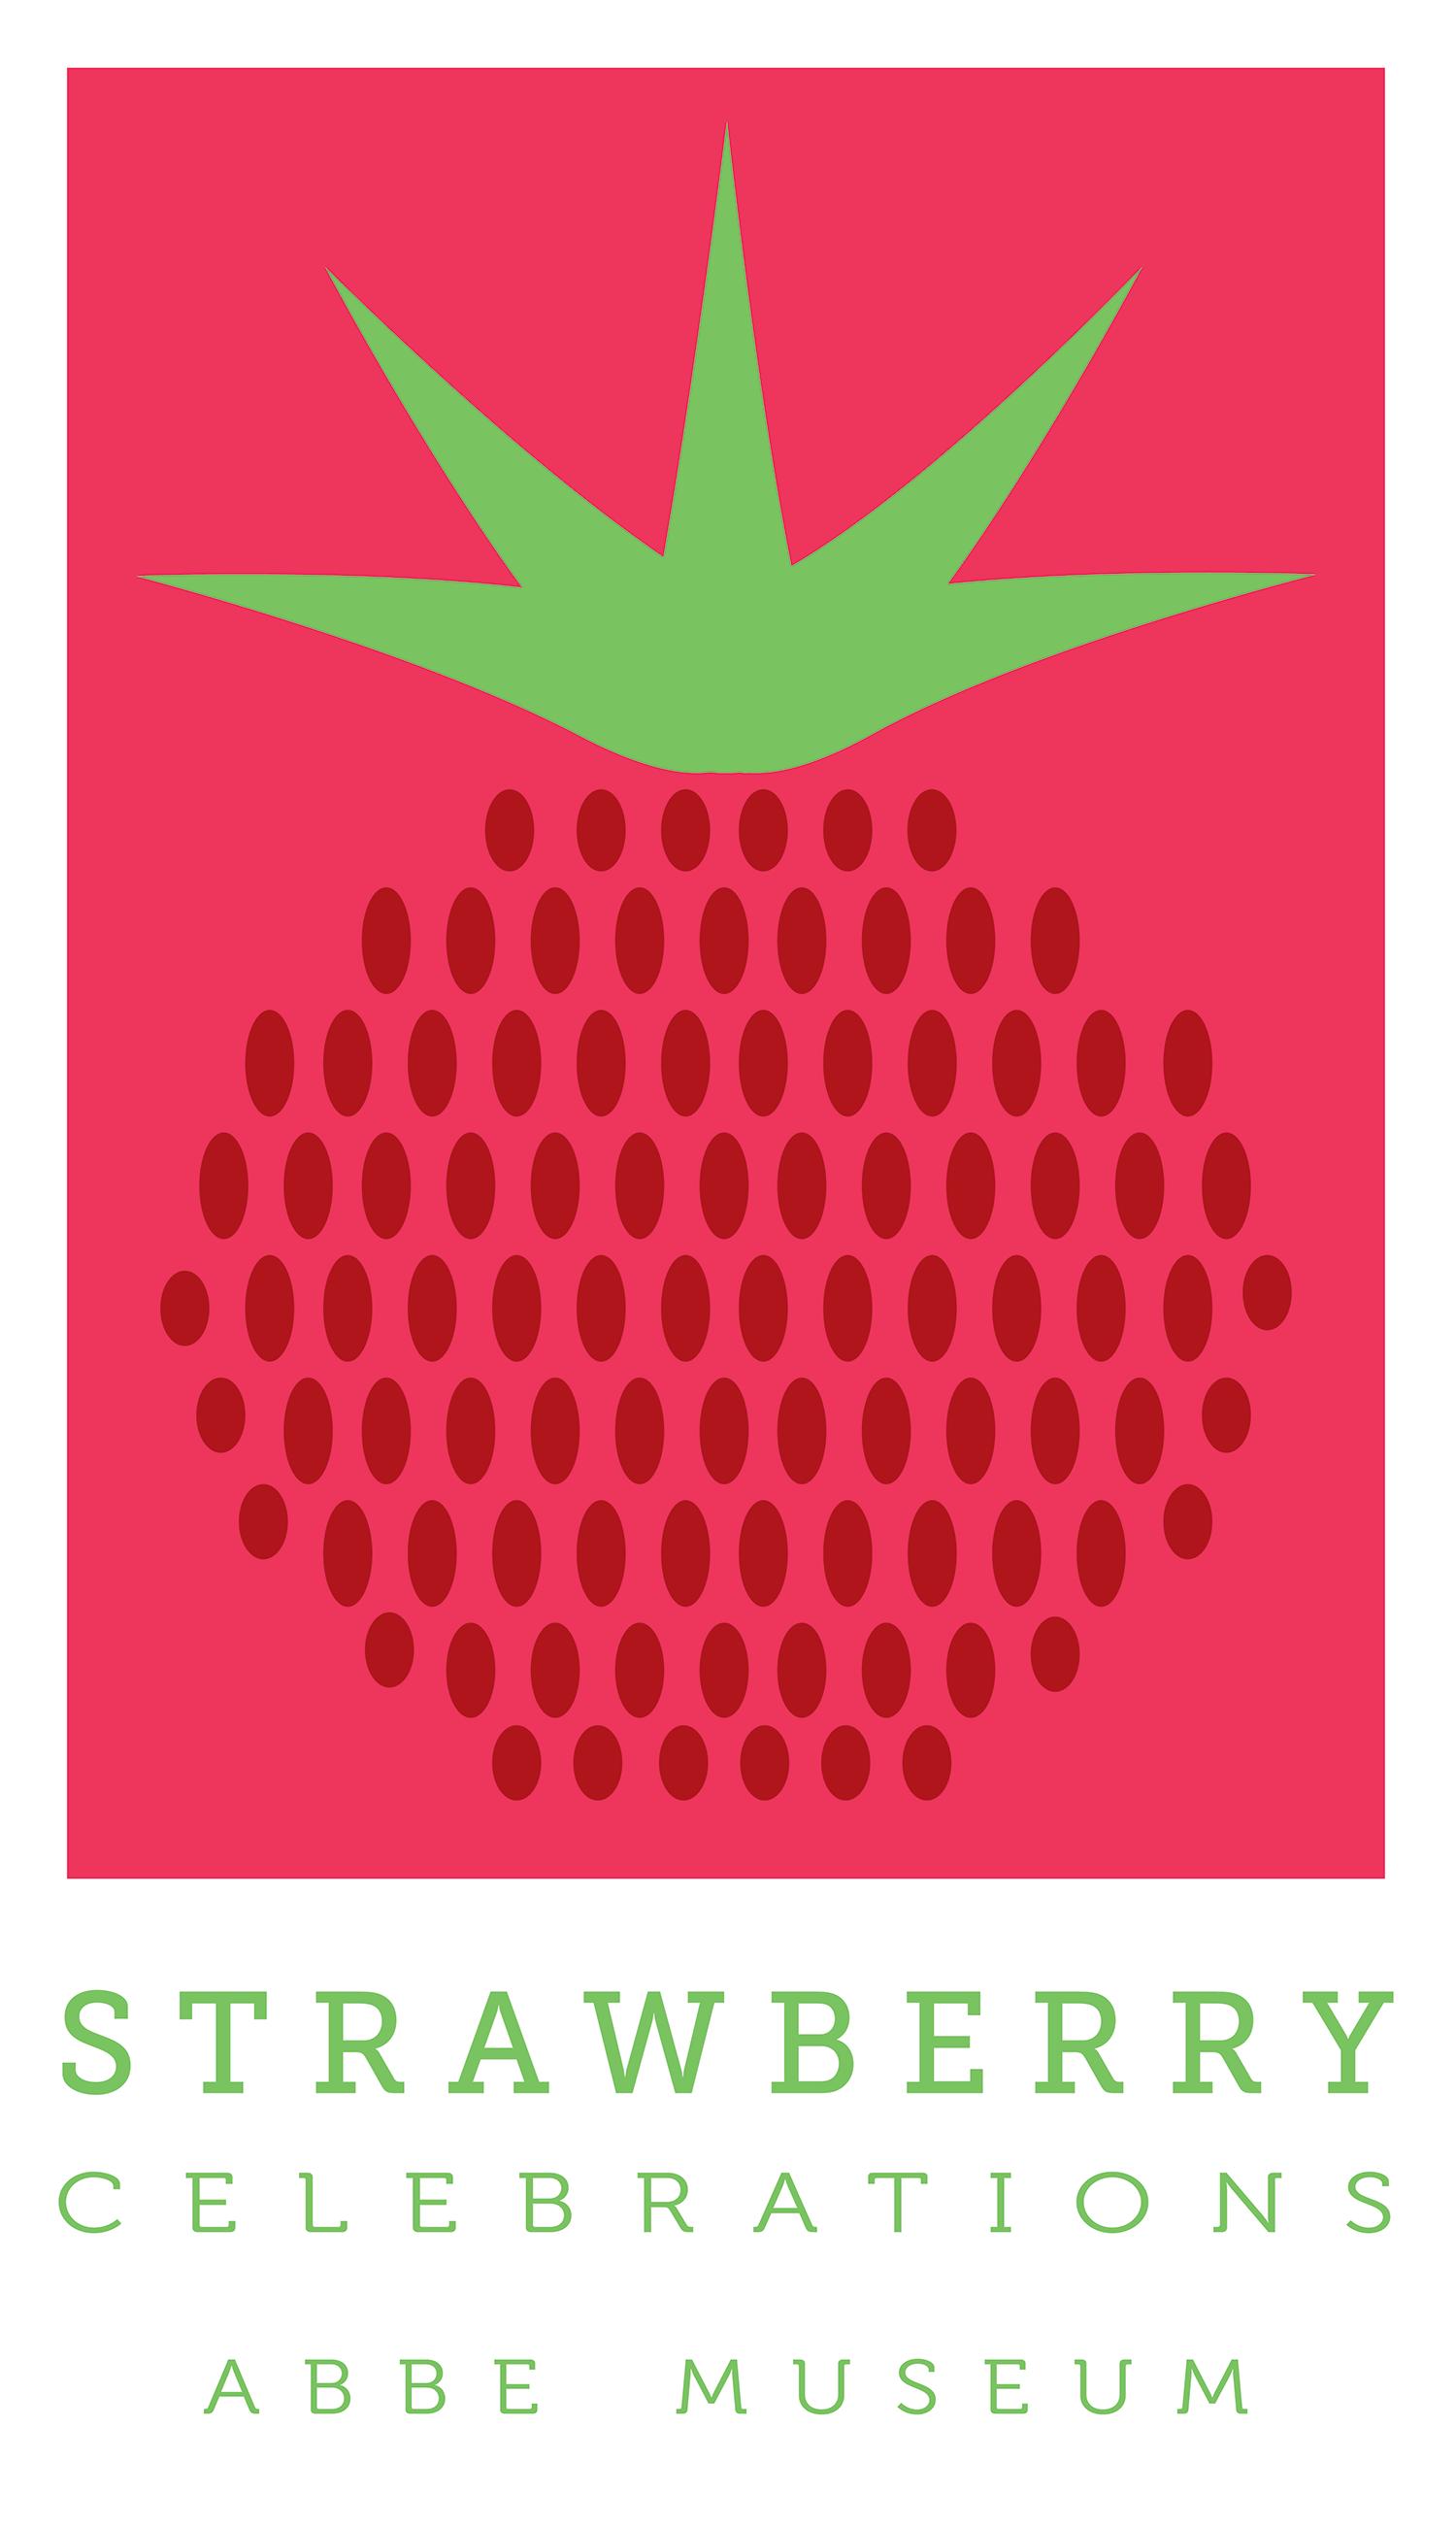 strawberrycelebrations6-22-17.png